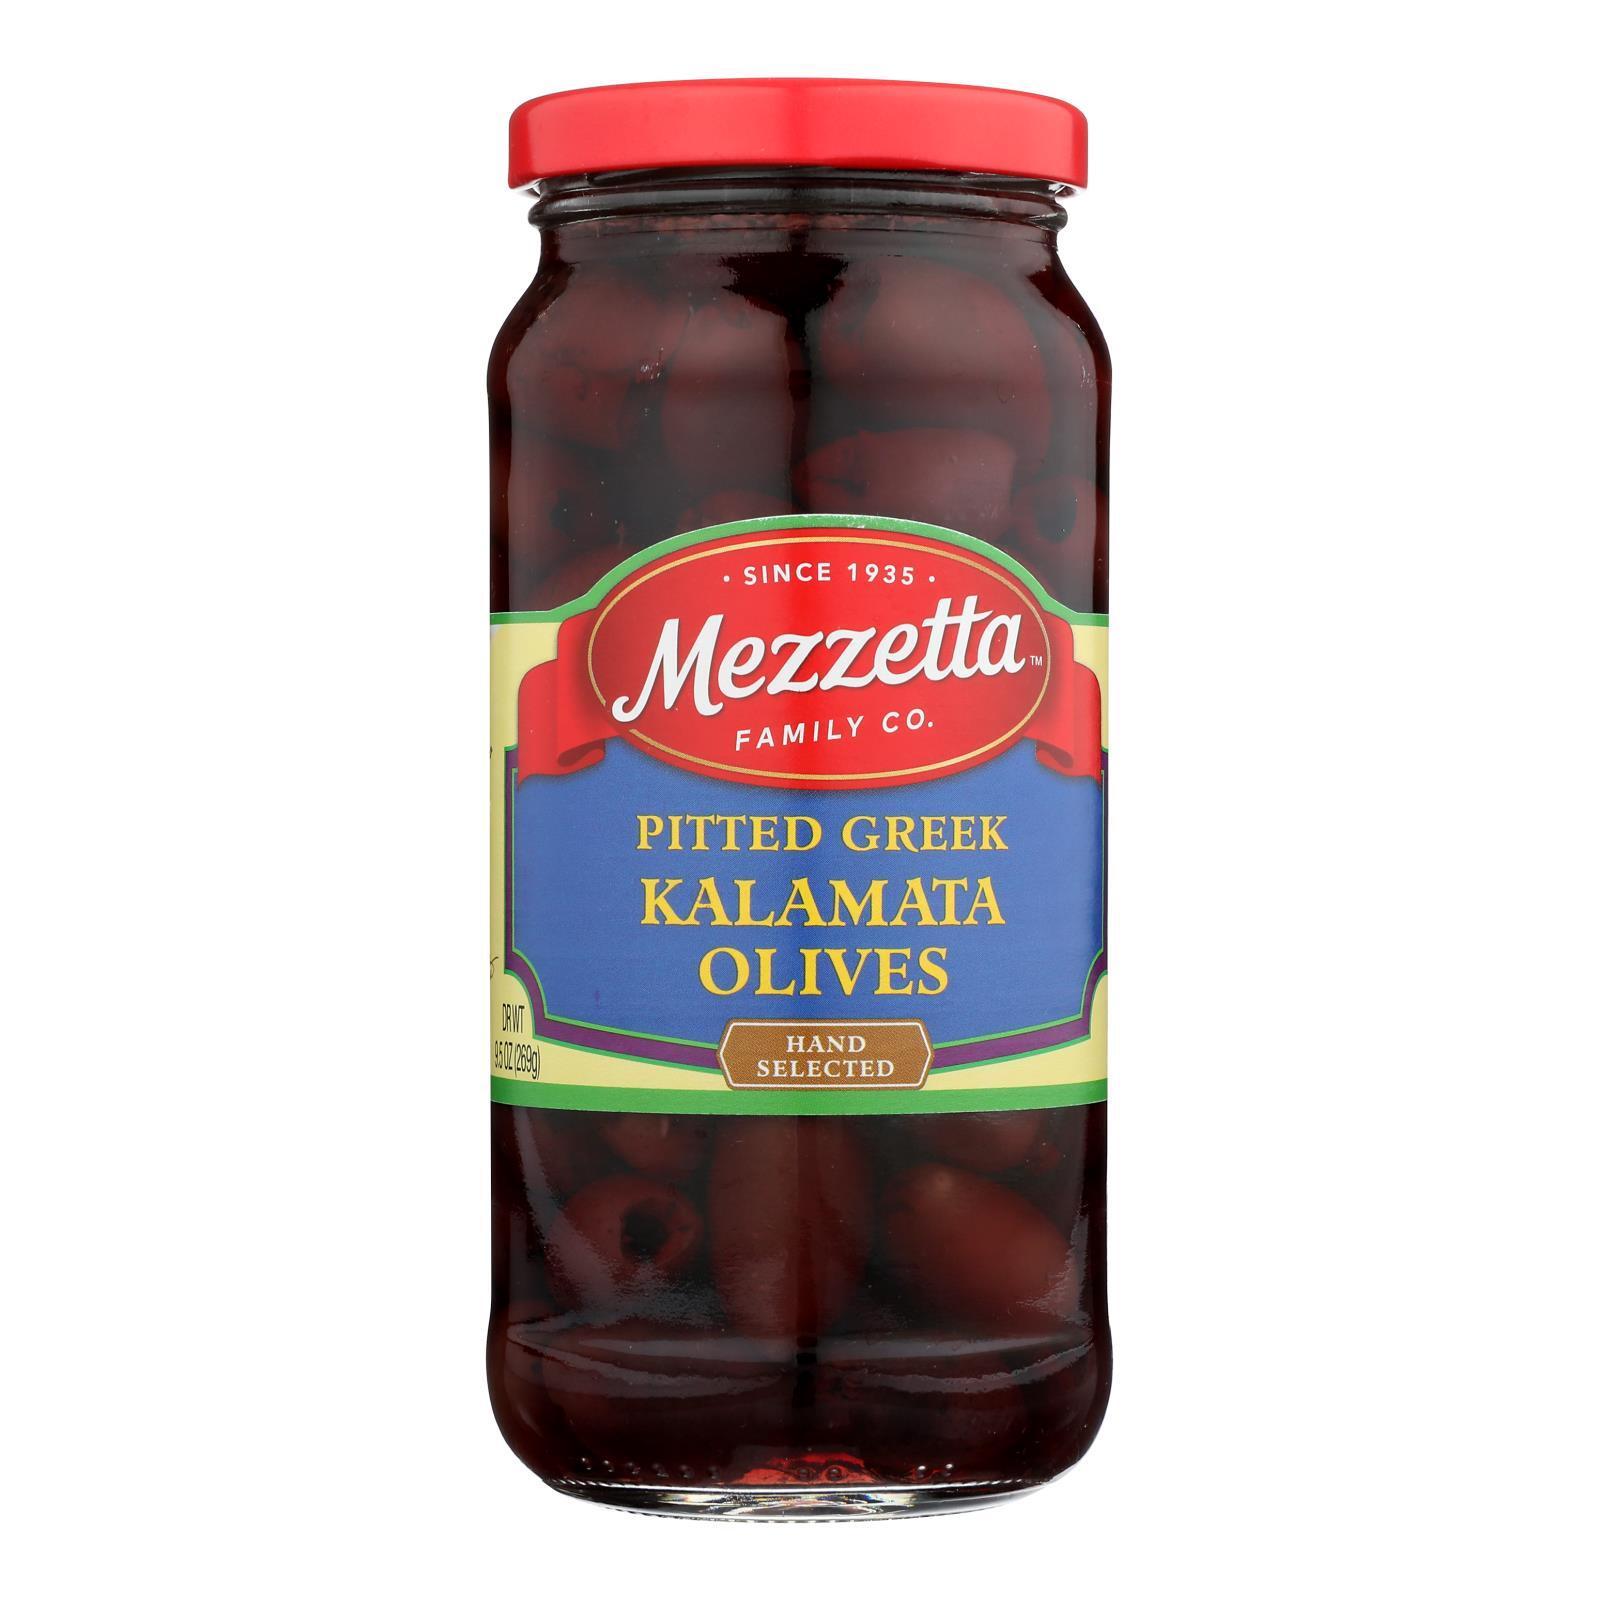 Mezzetta Pitted Greek Kalamata Olives - Case of 6 - 9.5 oz.